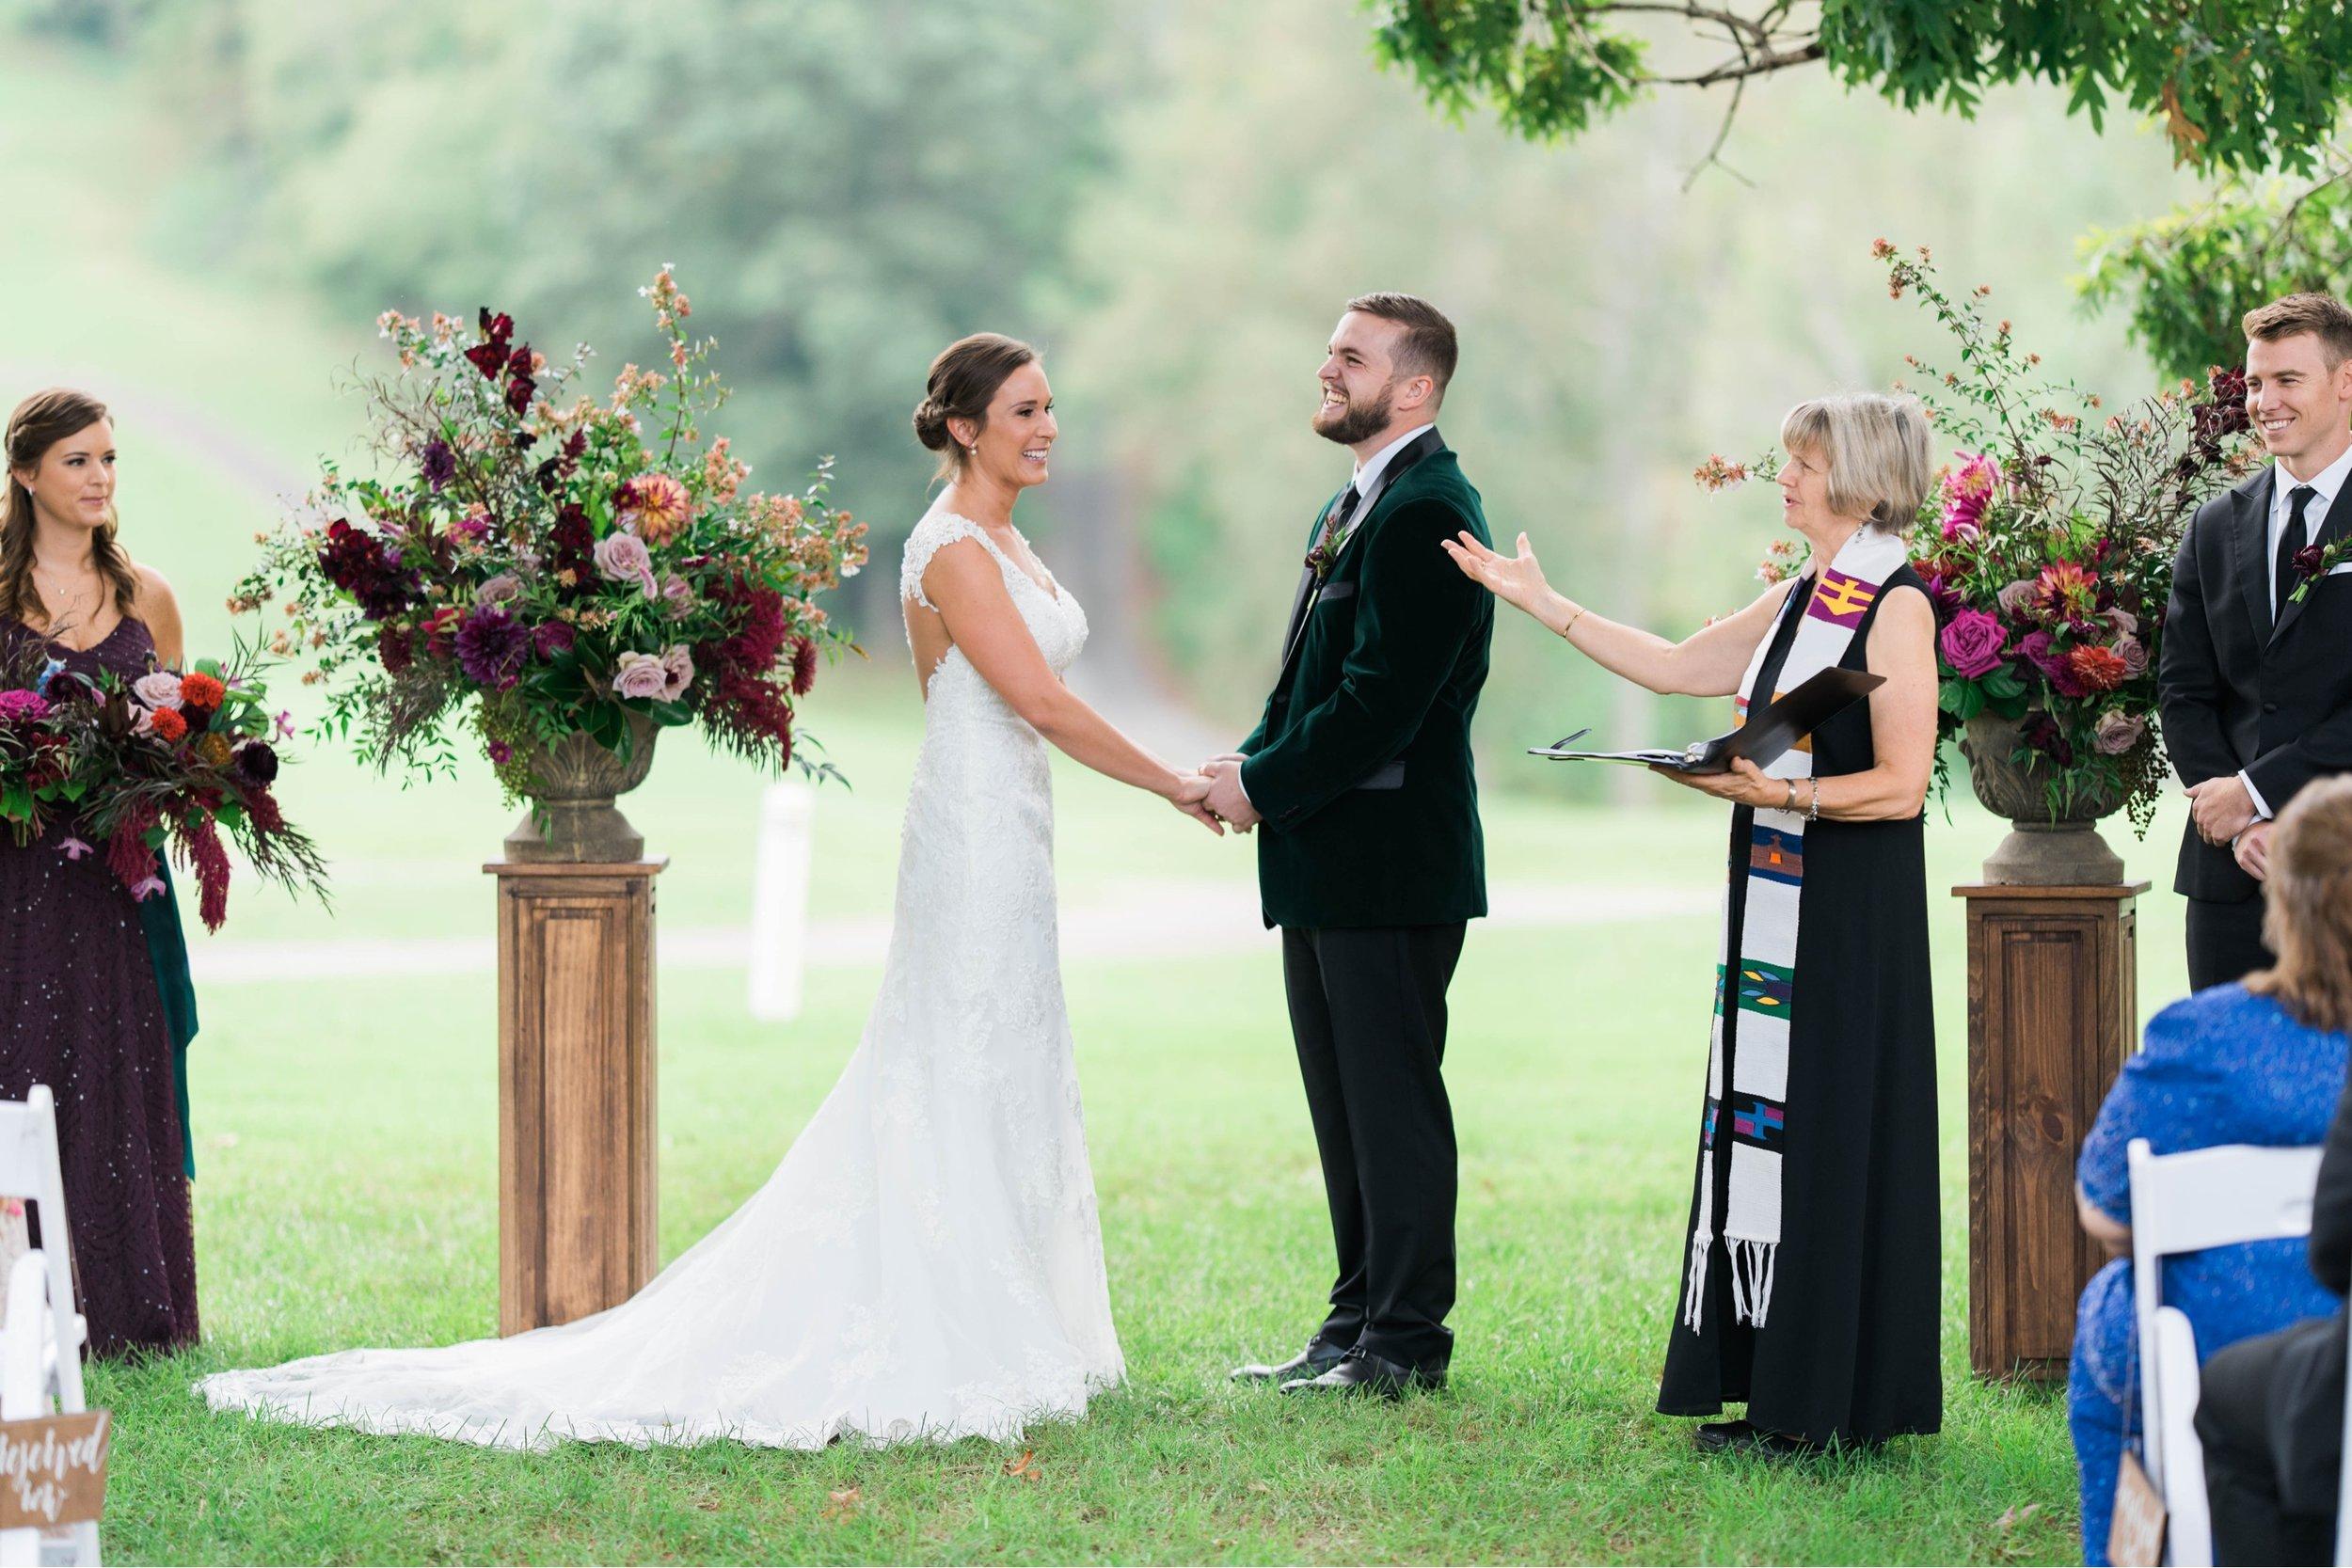 Gordan+Lauren_BoonsboroCountryClubWedding_Virginiaweddingphotographer_LynchburgVi 6.jpg